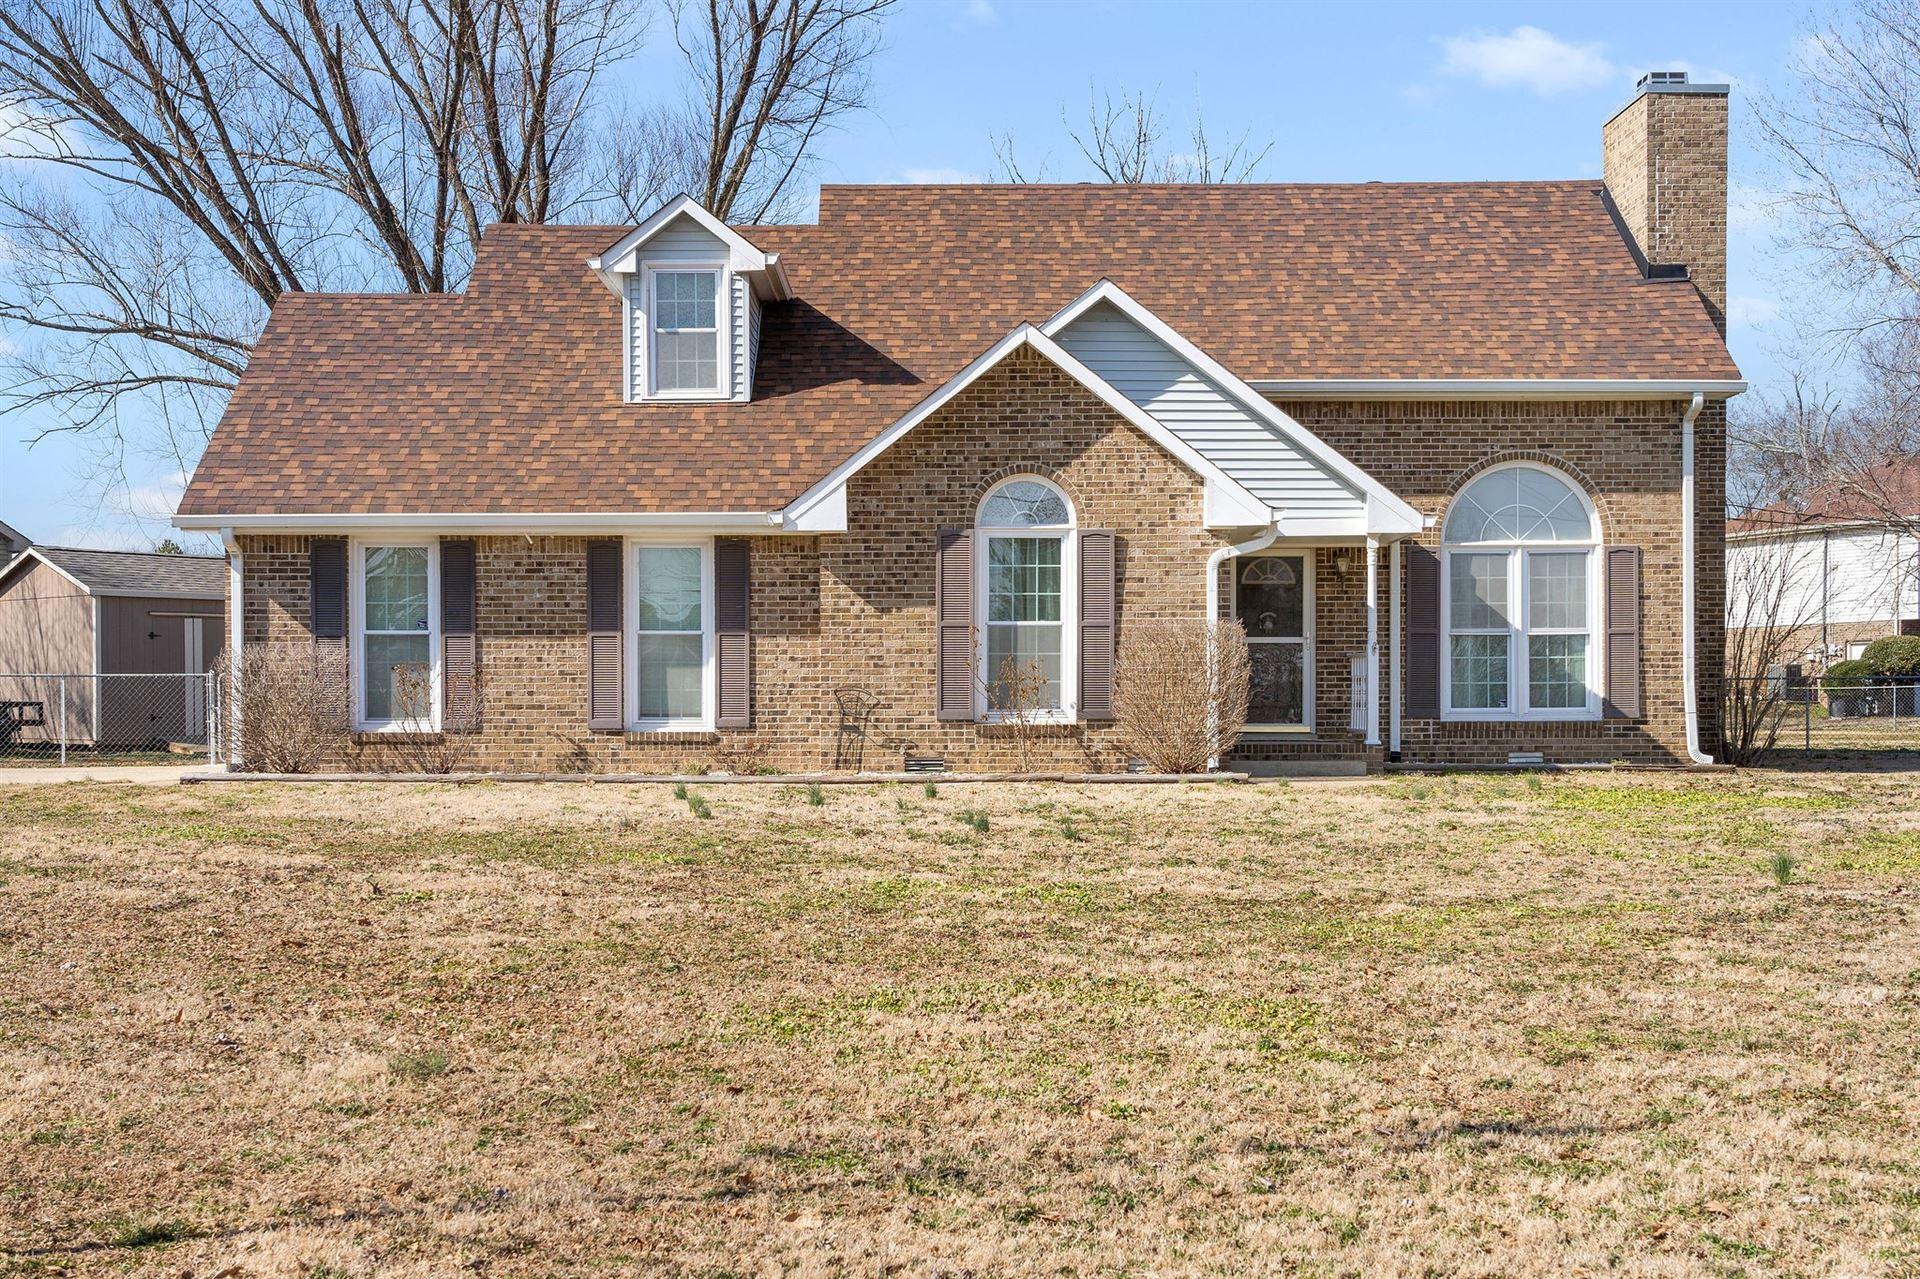 603 Gardendale Ln, Clarksville, TN 37040 - MLS#: 2231598